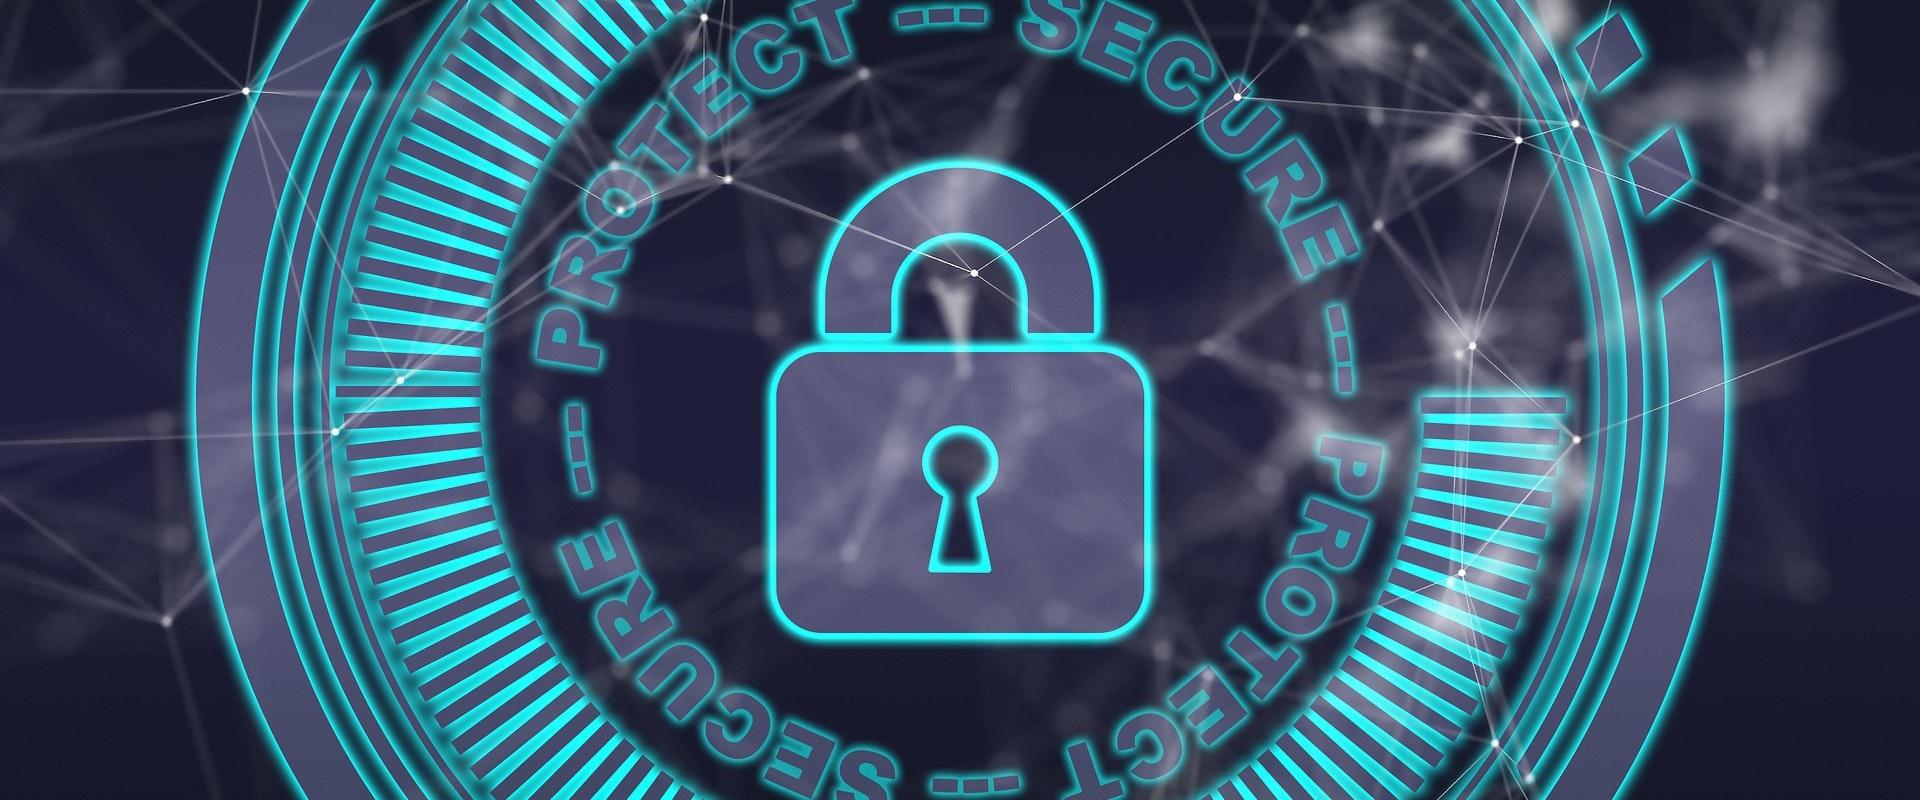 1554194683 security 40381641920